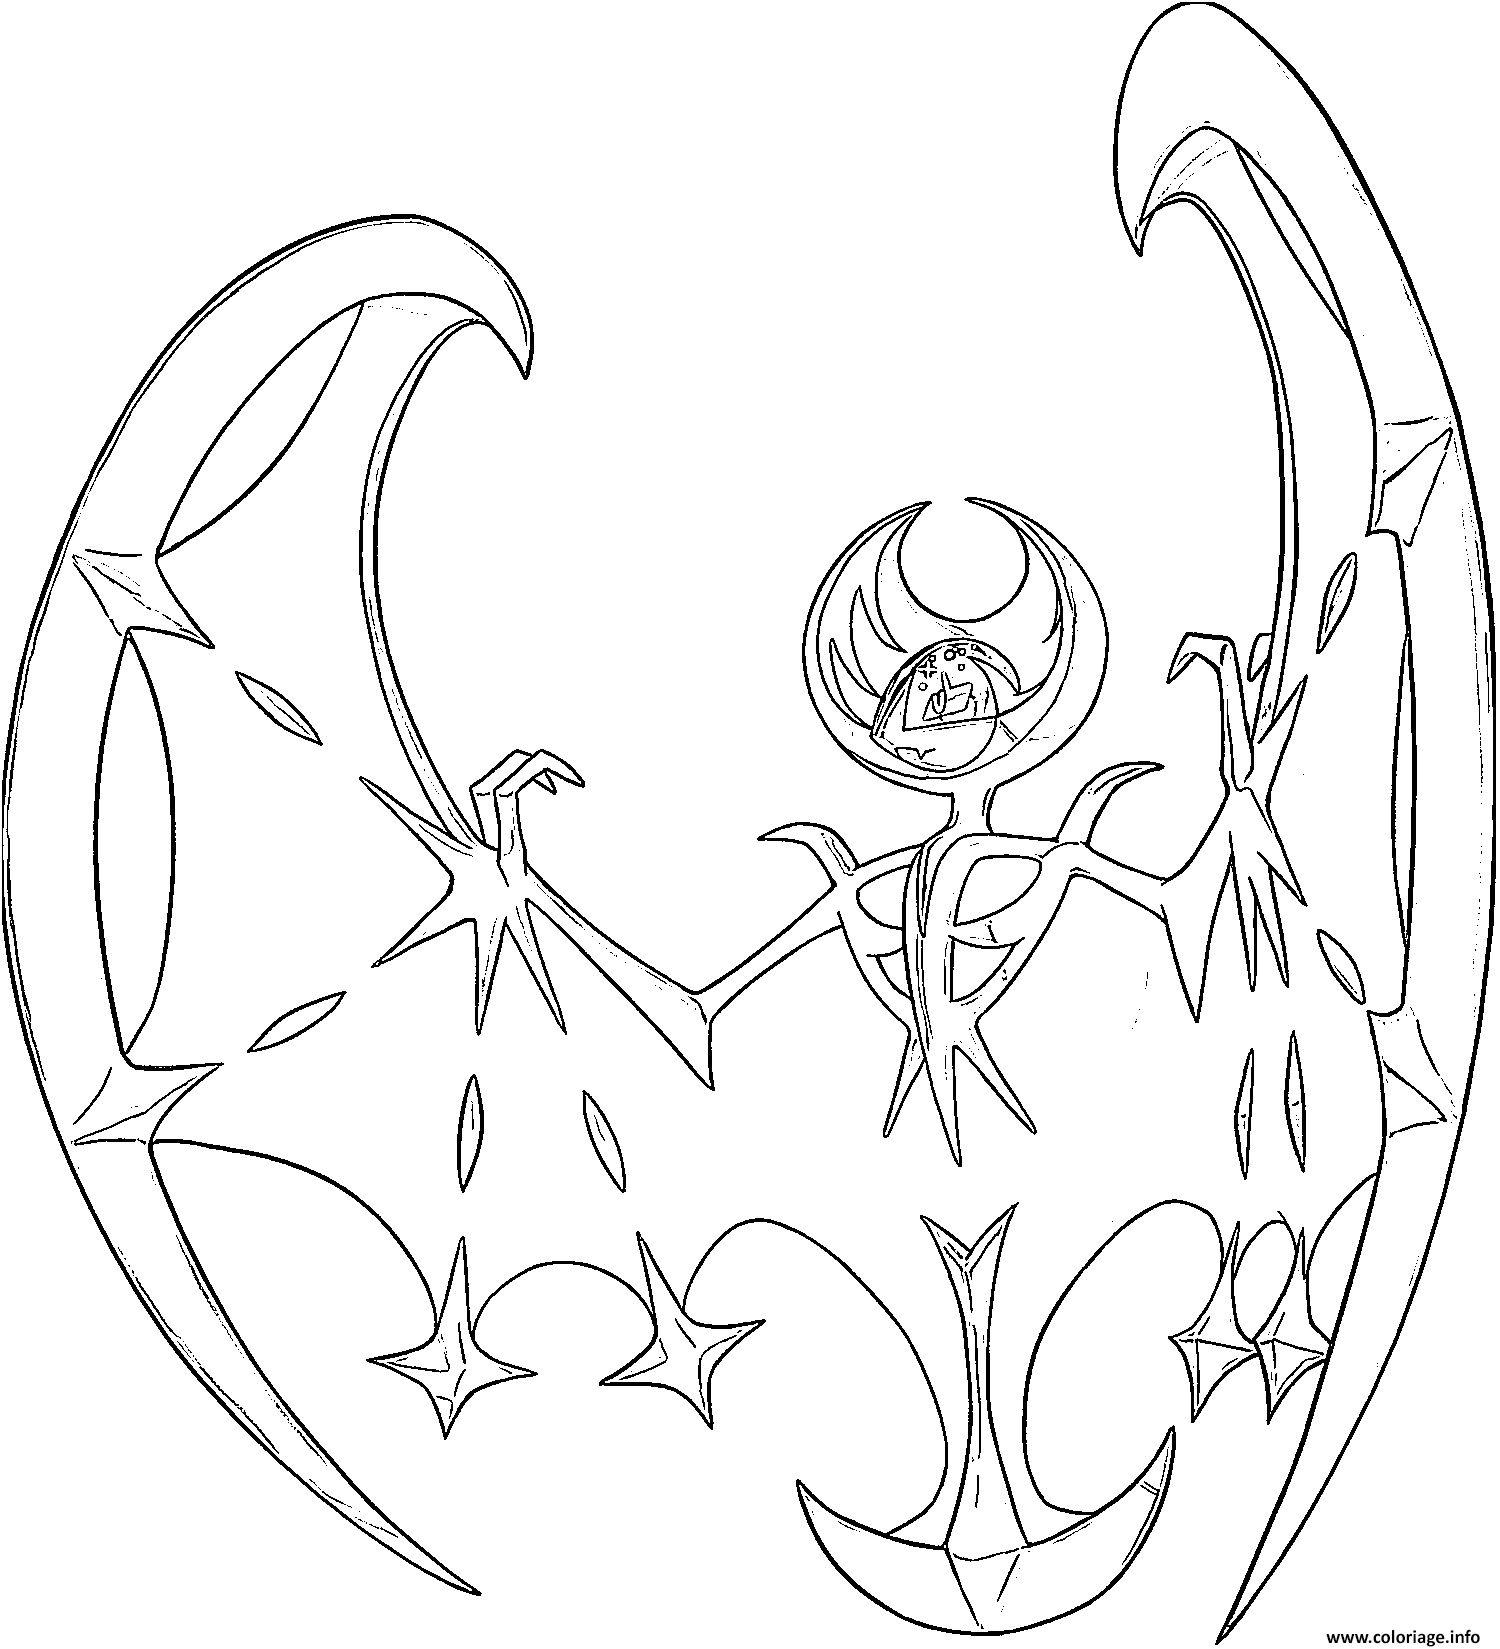 8 Aimable Pokemon Lunala Coloriage Images